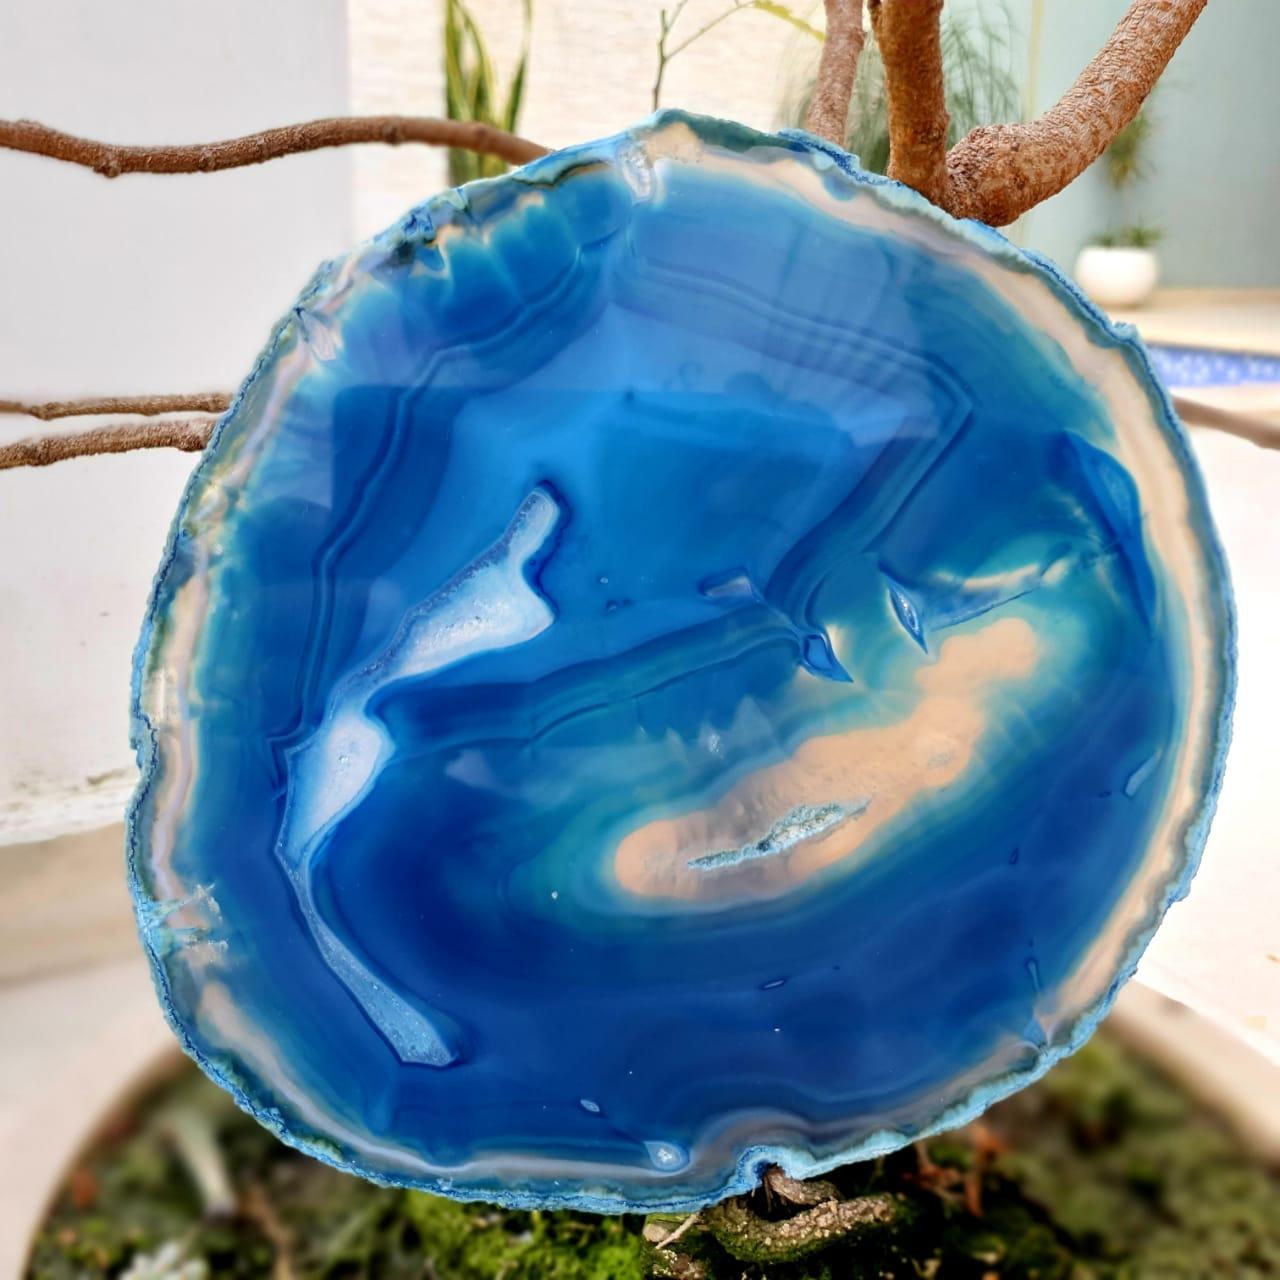 Cristal - Chapa - Placa Ágata Azul - PEÇA ÚNICA